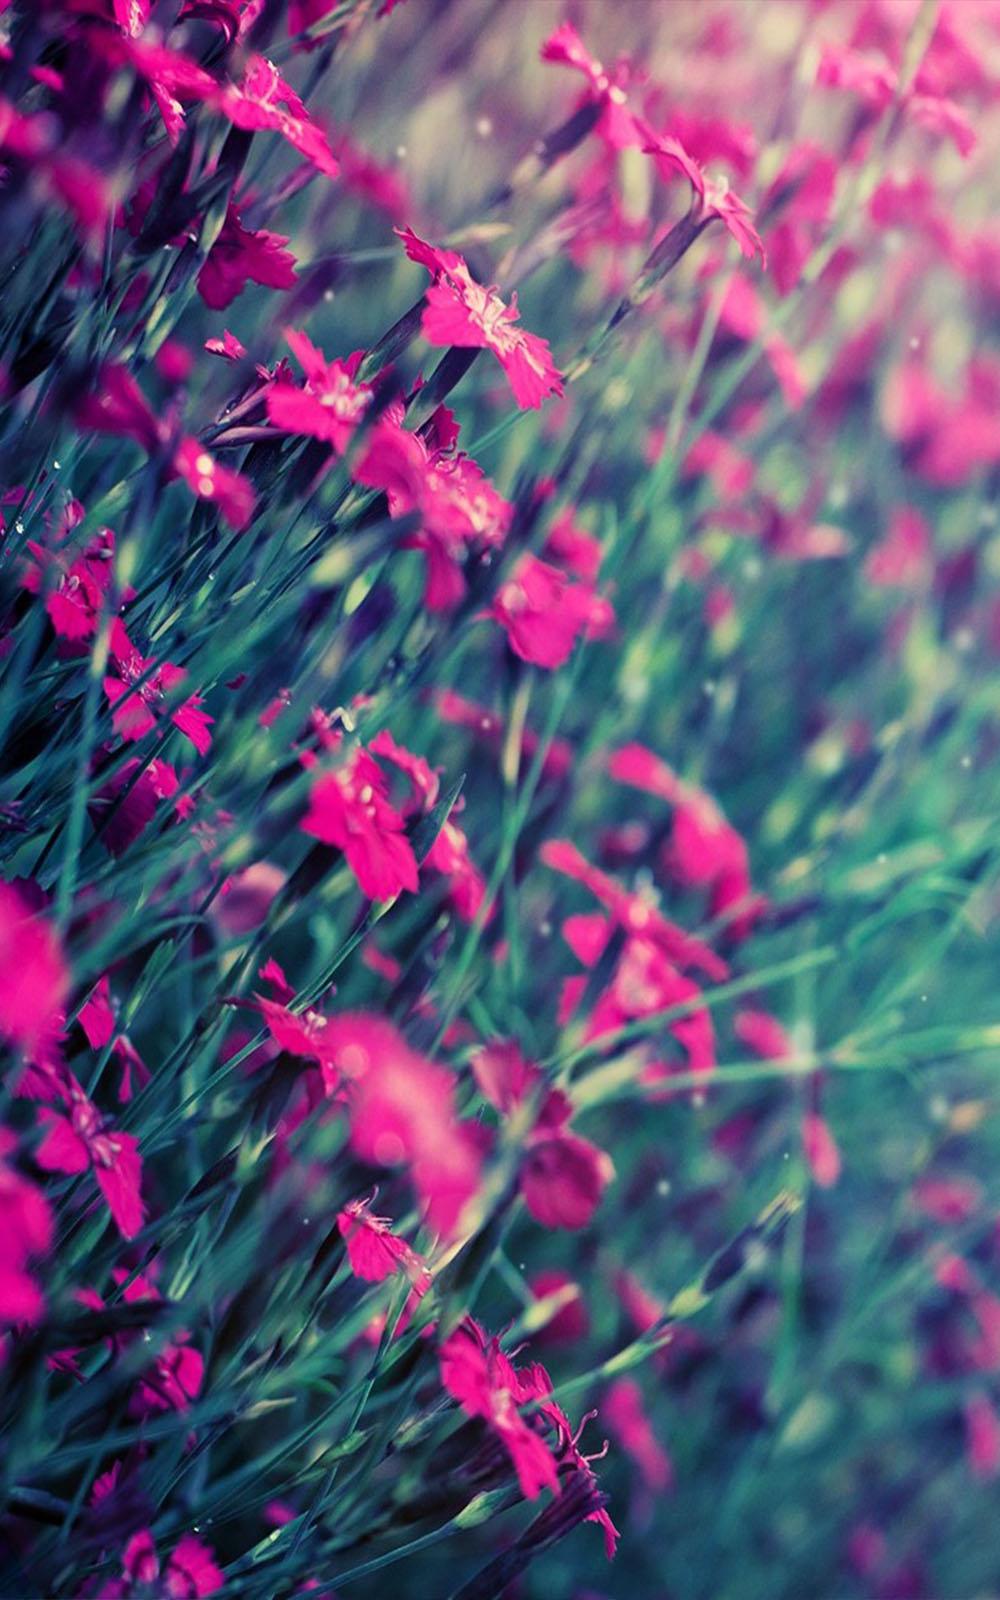 Download Beautiful Pink Flowers Free Pure 4k Ultra Hd Mobile Wallpaper